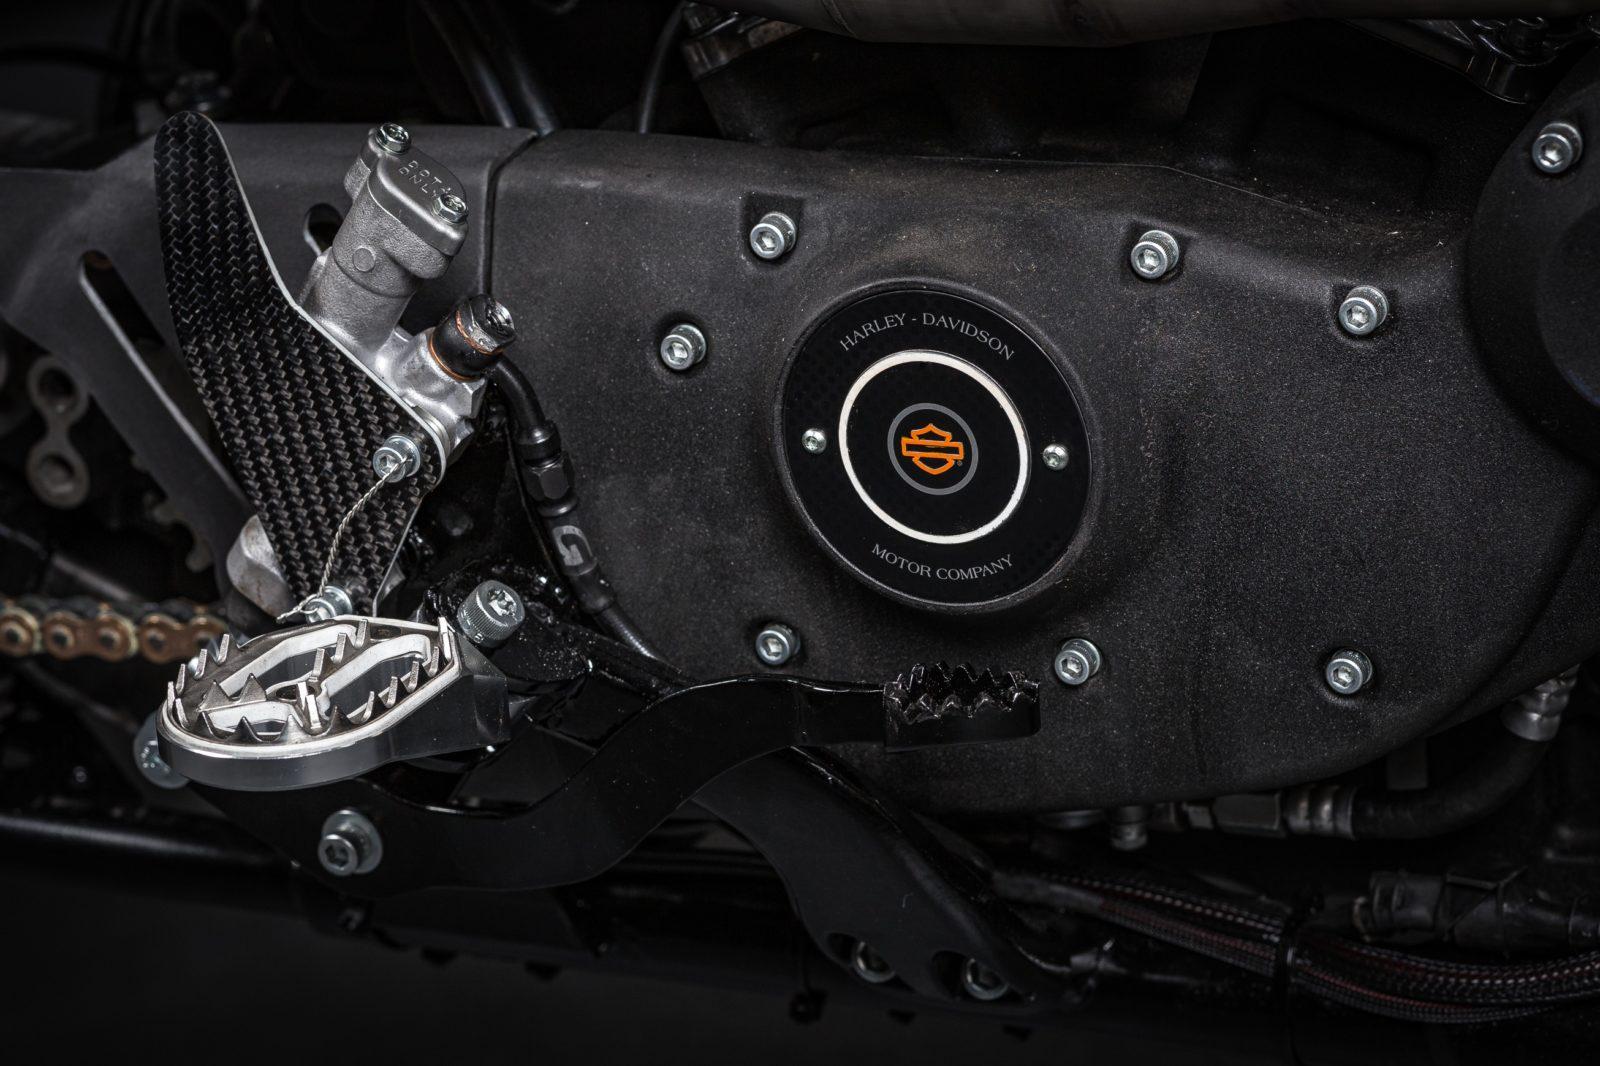 Harley flat track Davidson moto wheels waves